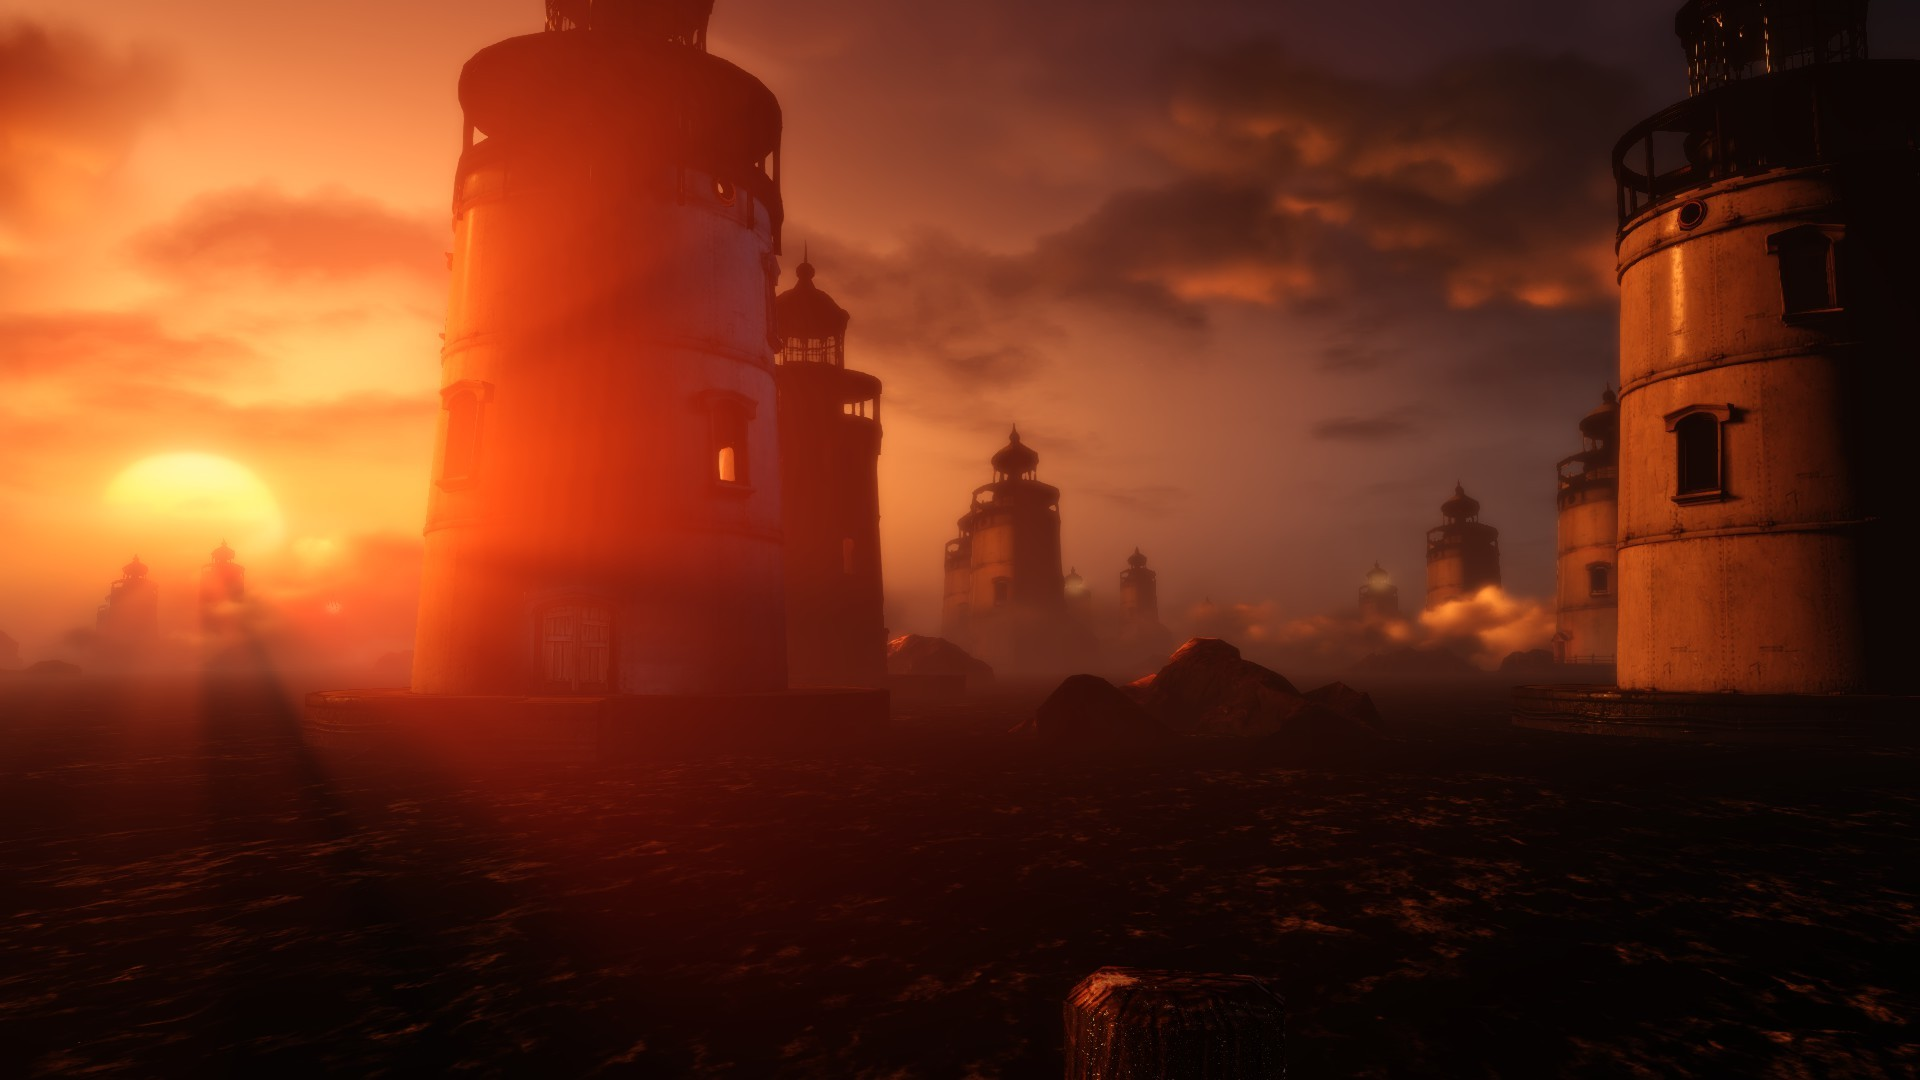 Prince Of Persia 3d Wallpaper Elizabeth Bioshock Sun Rays Bioshock Infinite Burial